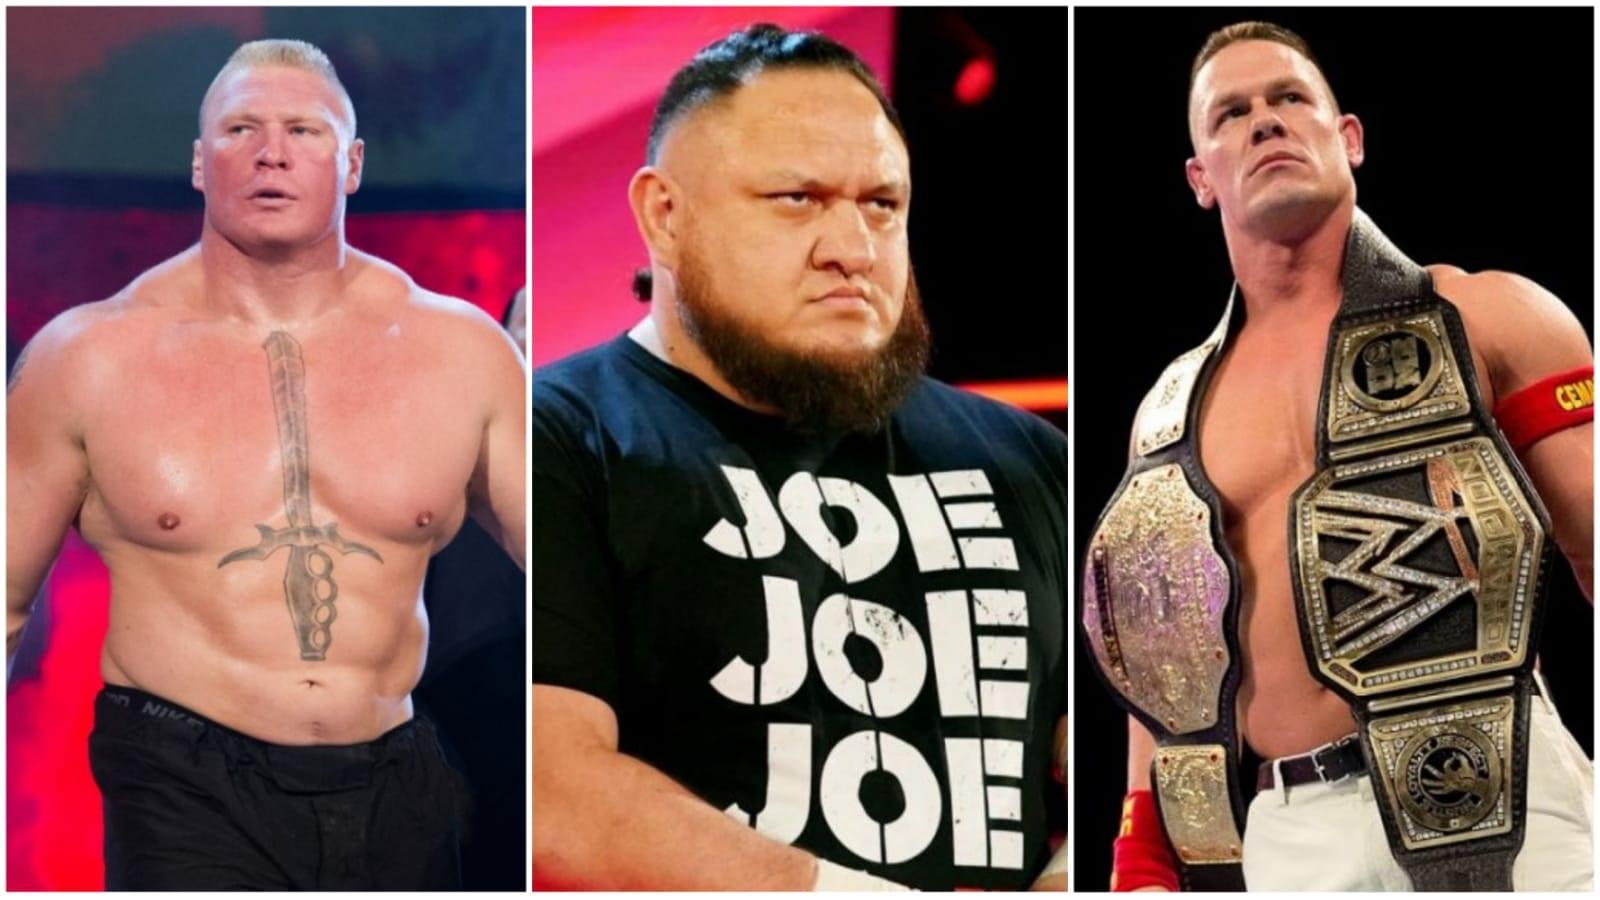 WrestleMania - Surprise returns on night after